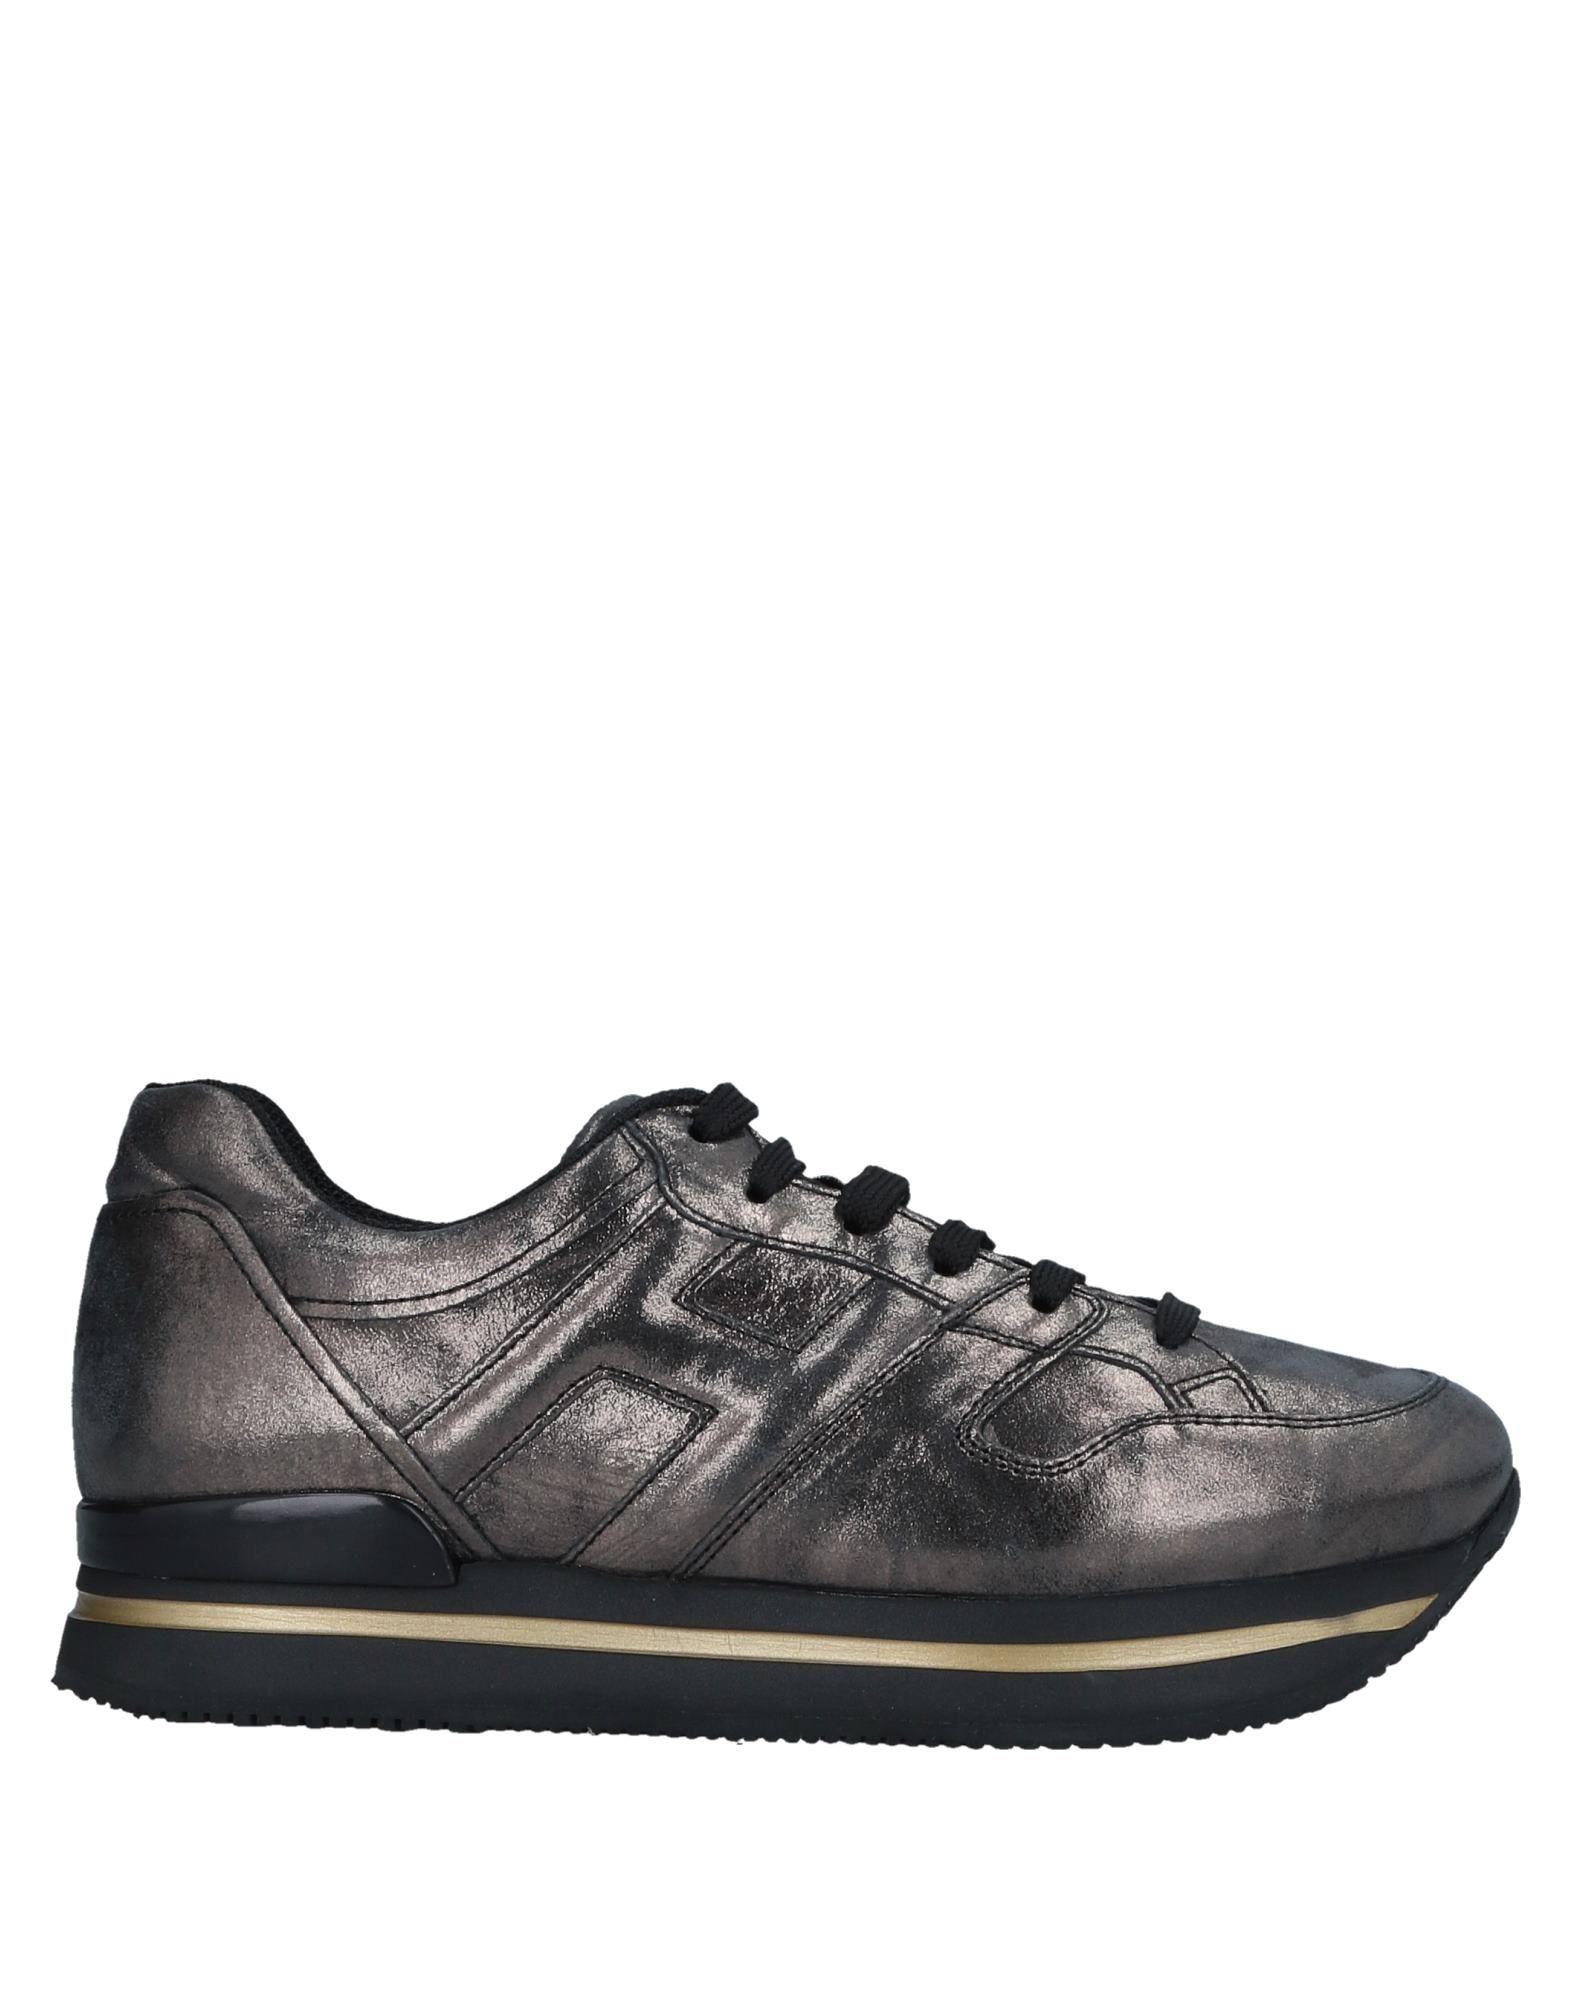 Hogan Sneakers Damen  11365712NRGut aussehende strapazierfähige Schuhe